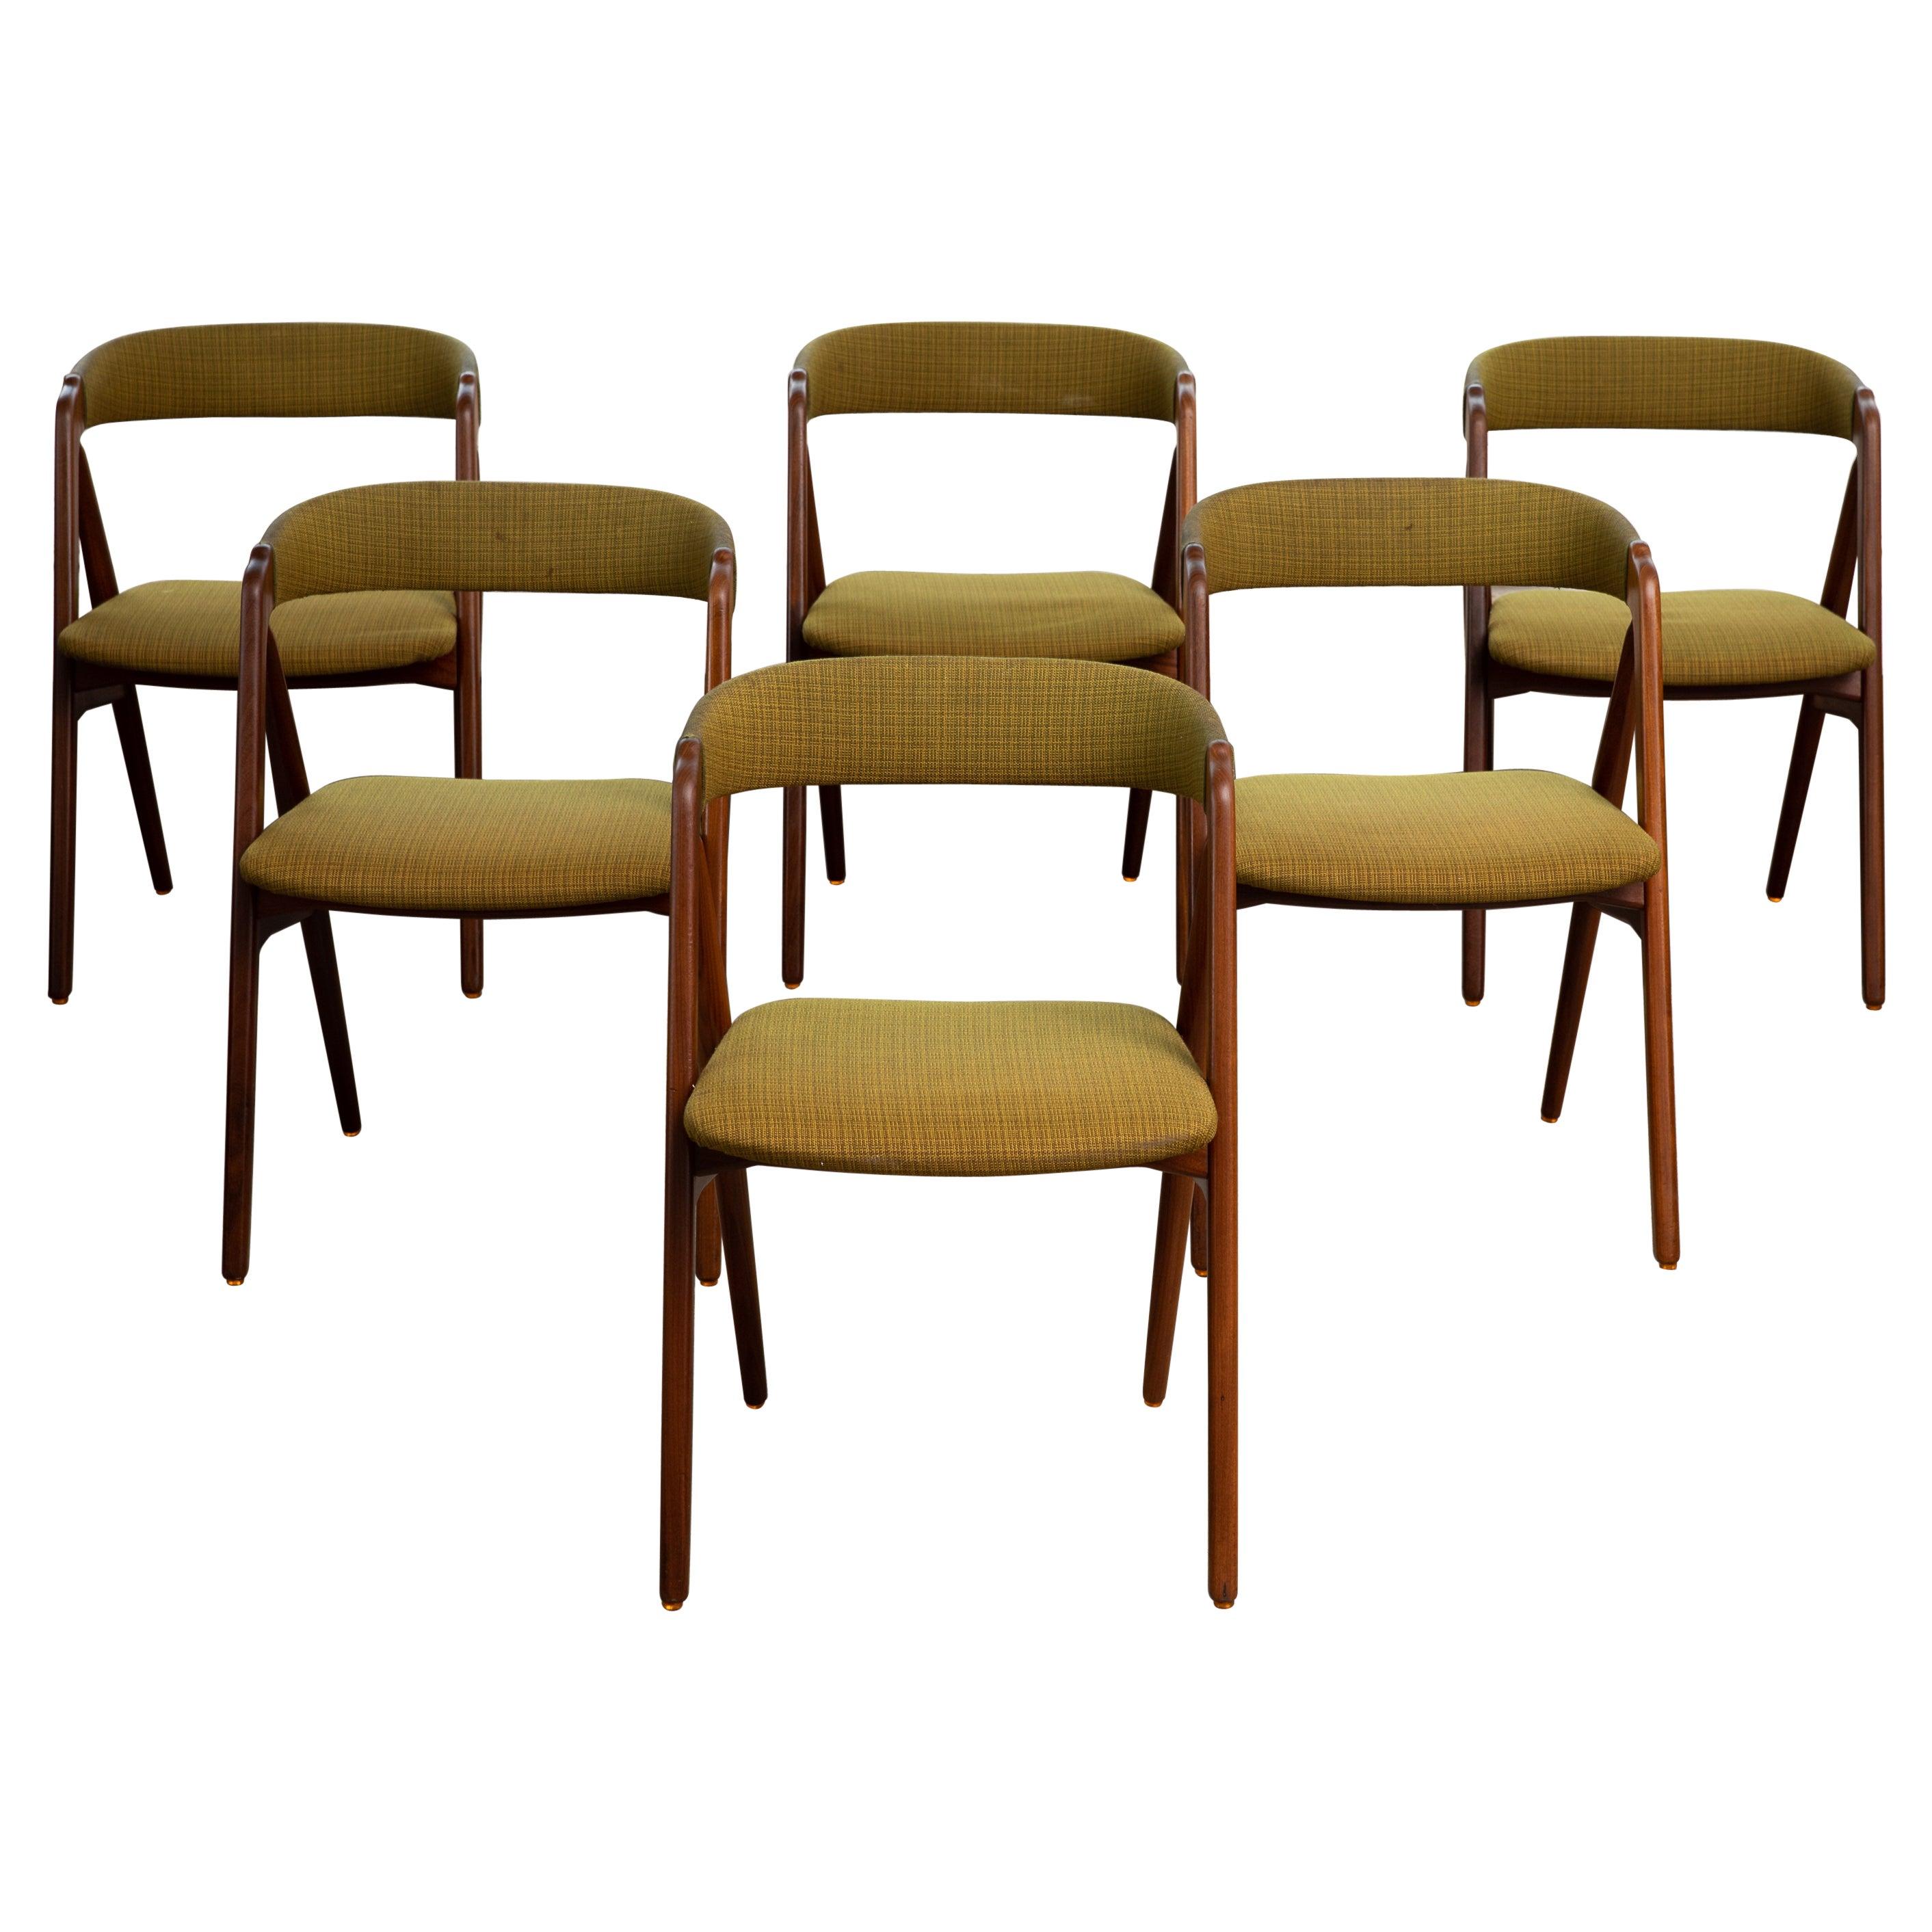 Set of Six Kai Kristiansen Teak A-Frame Dining Chairs in Teak 1950's Denmark